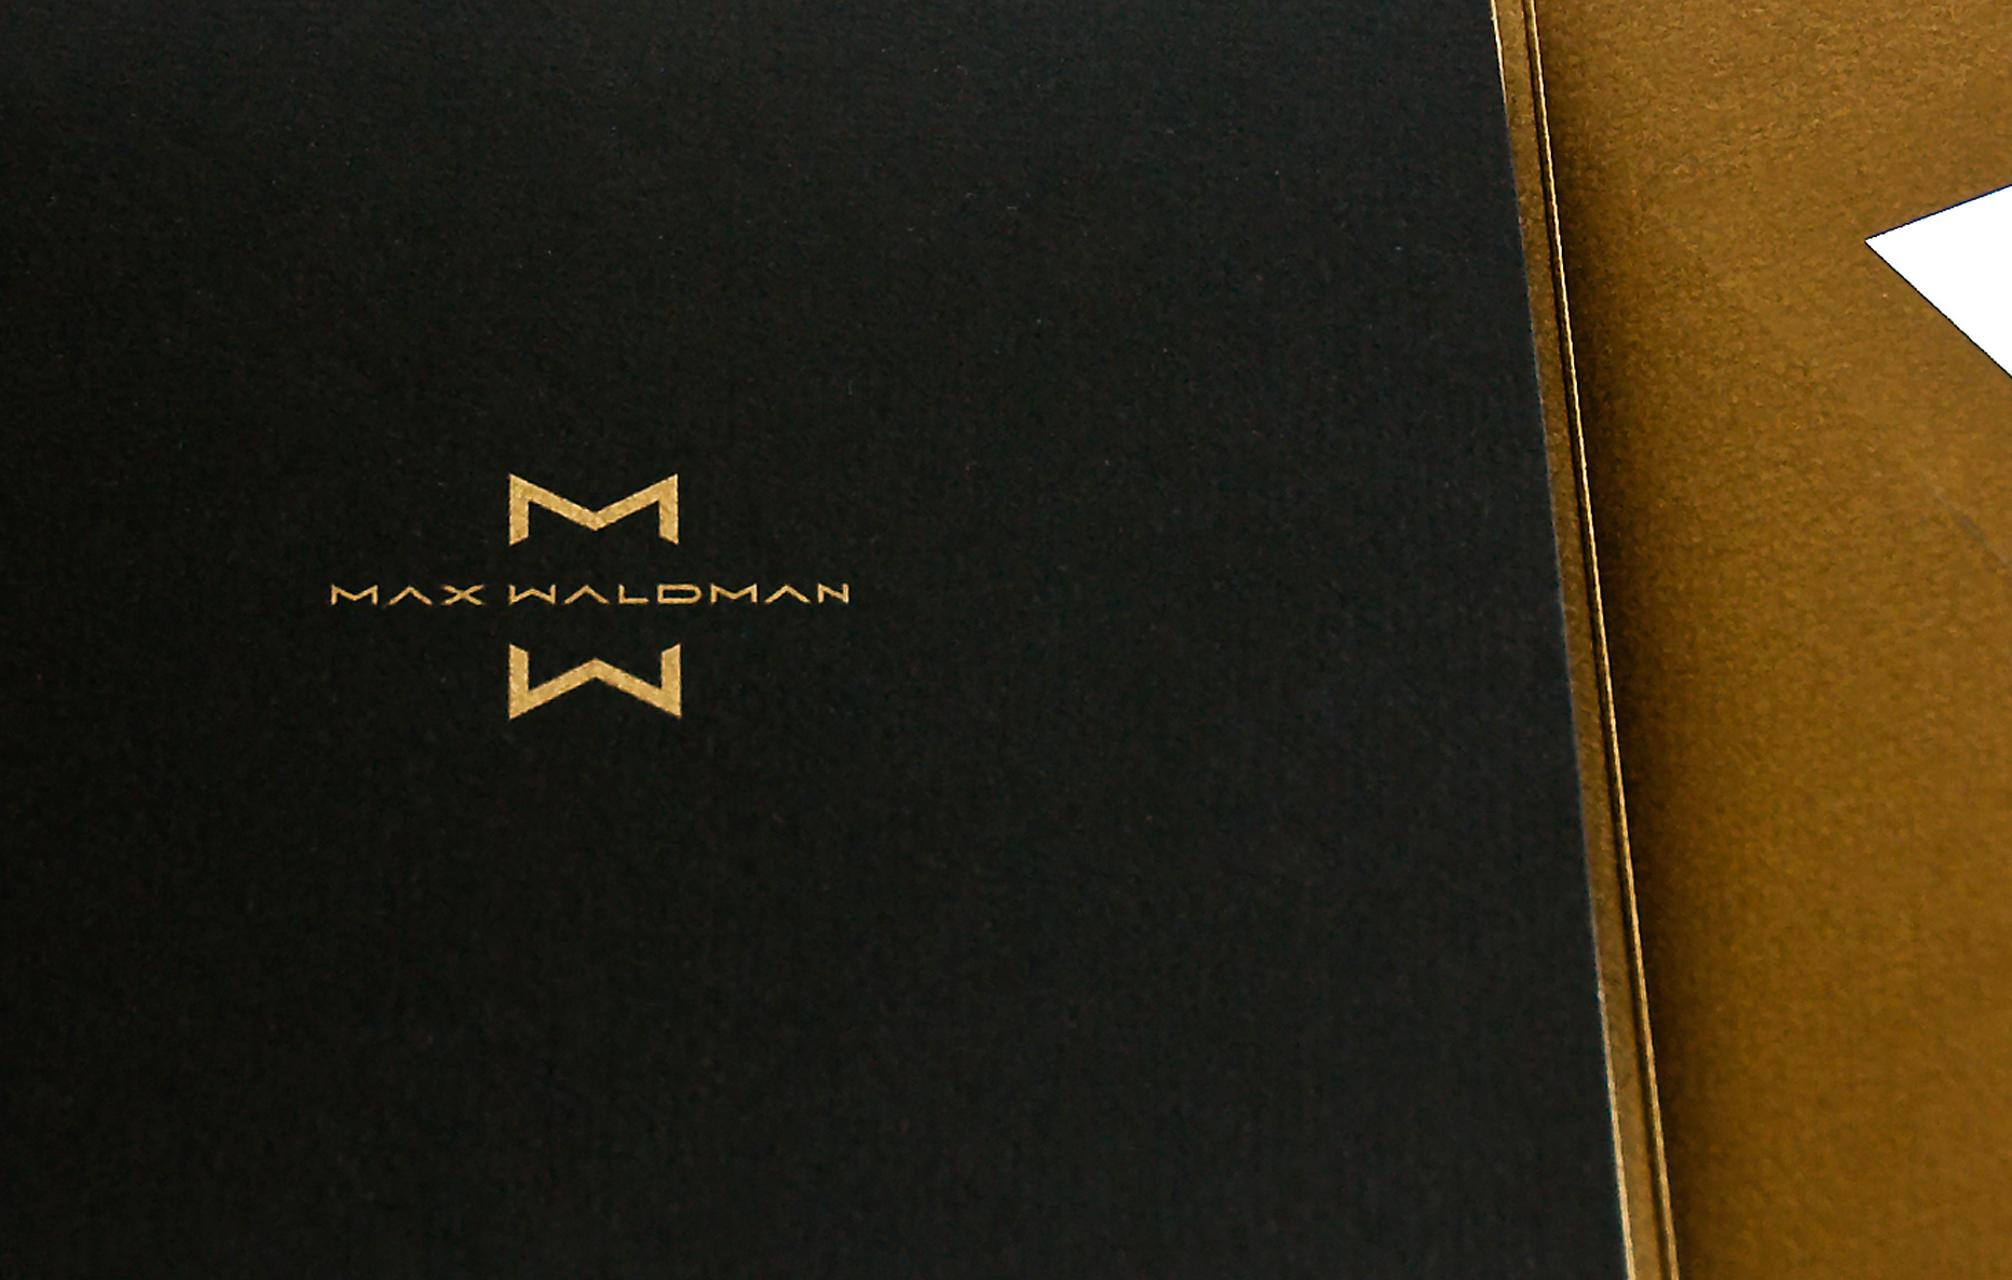 MAX WALDMAN / bar mitzvah logo, invite & event design /  studio credit :St. Bernadine Mission Communications Inc.